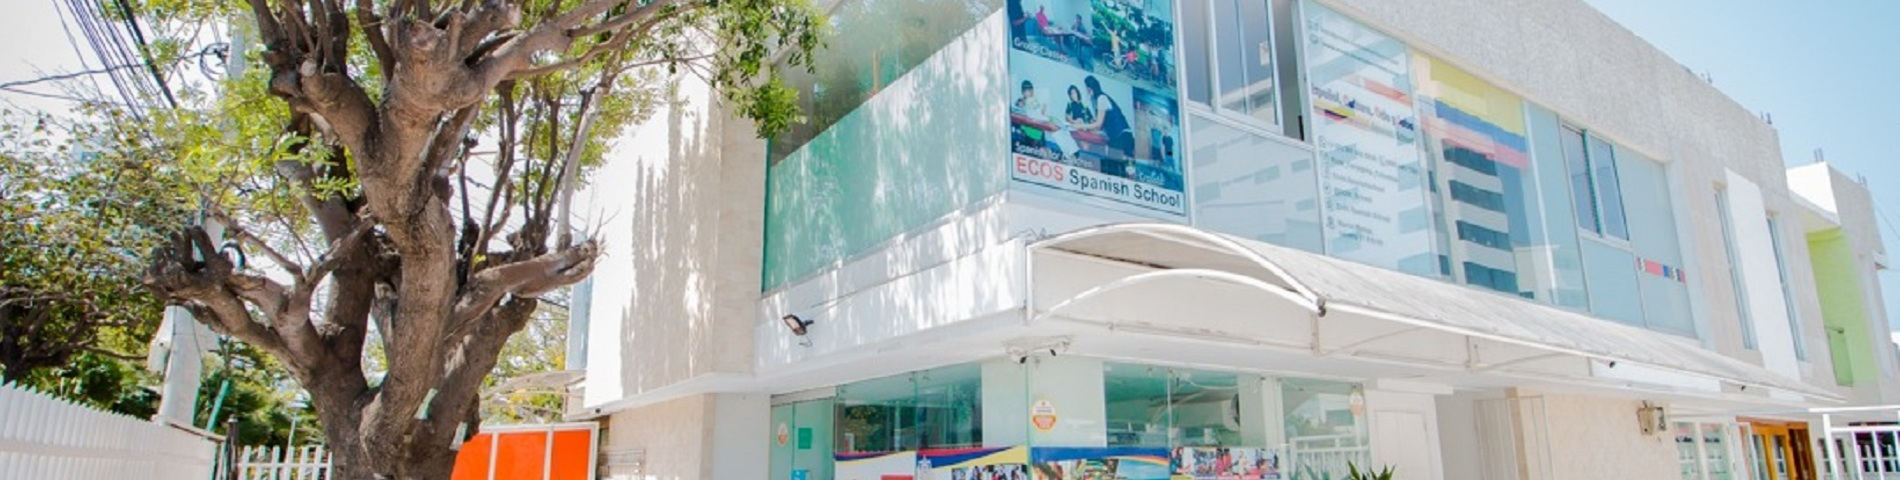 ECOS Spanish School bilde 1